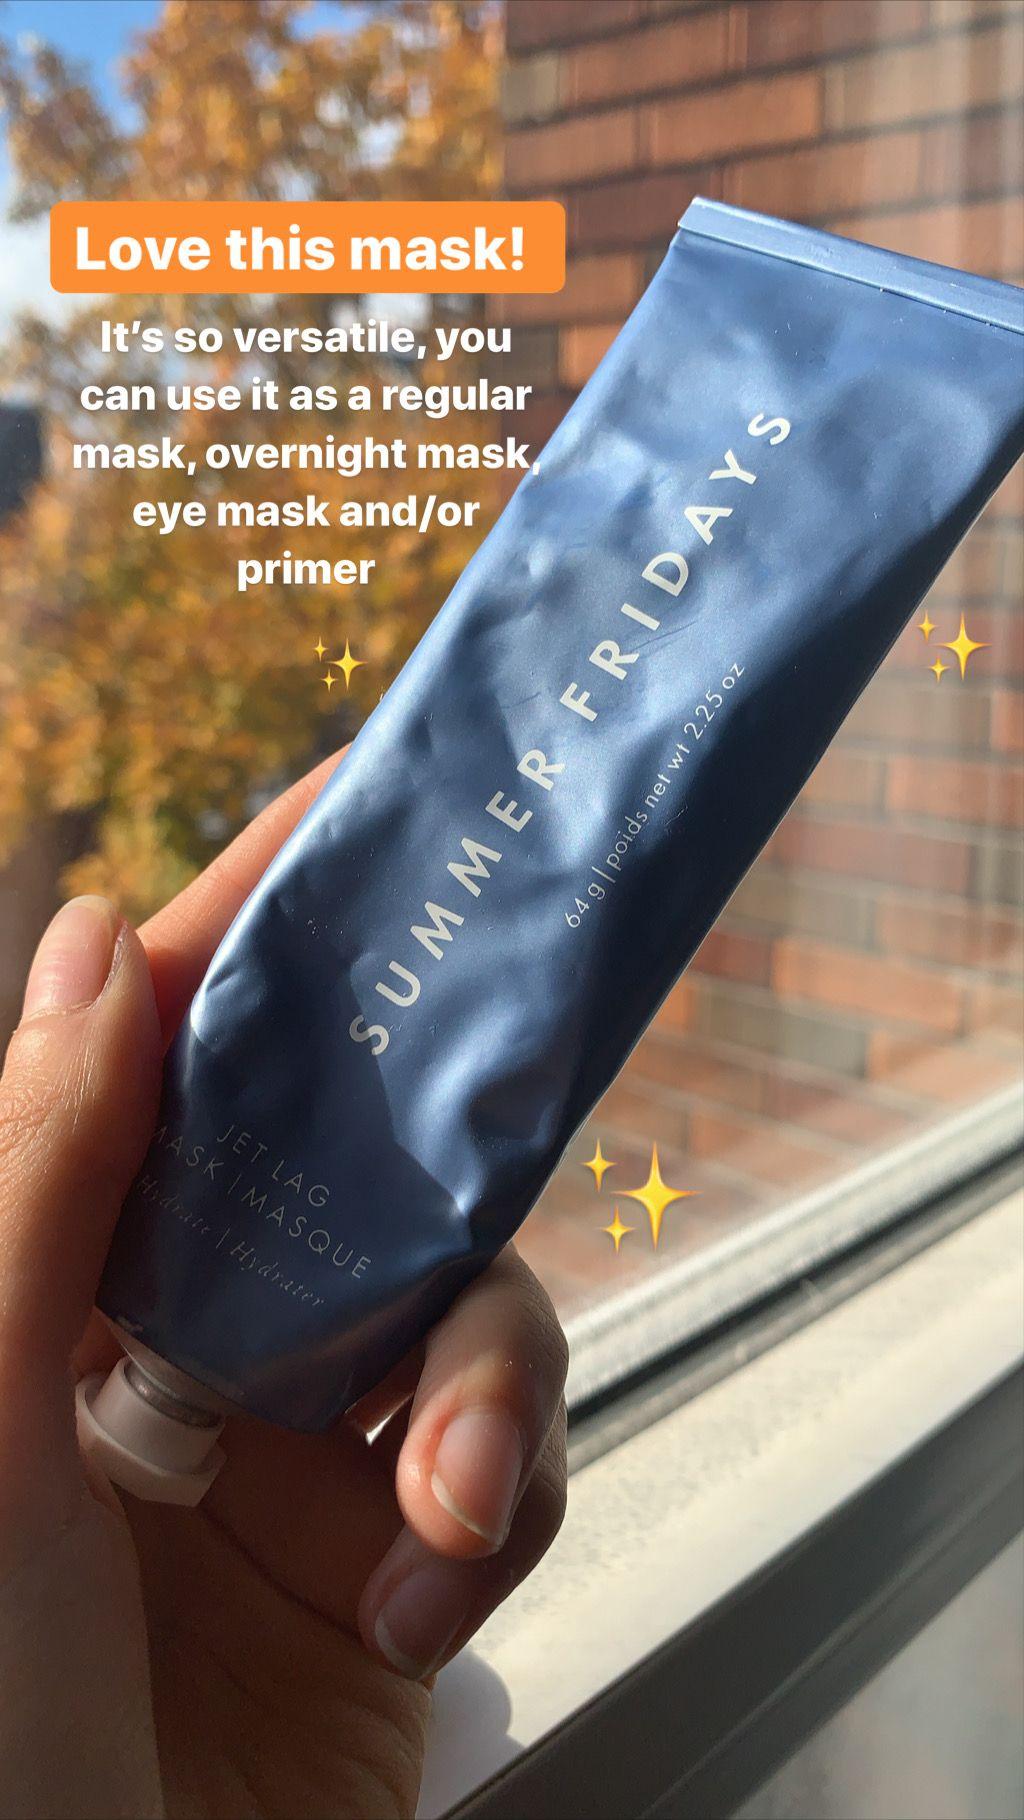 REVIEW // Jet lag mask by Summer Fridays Jet lag, Summer